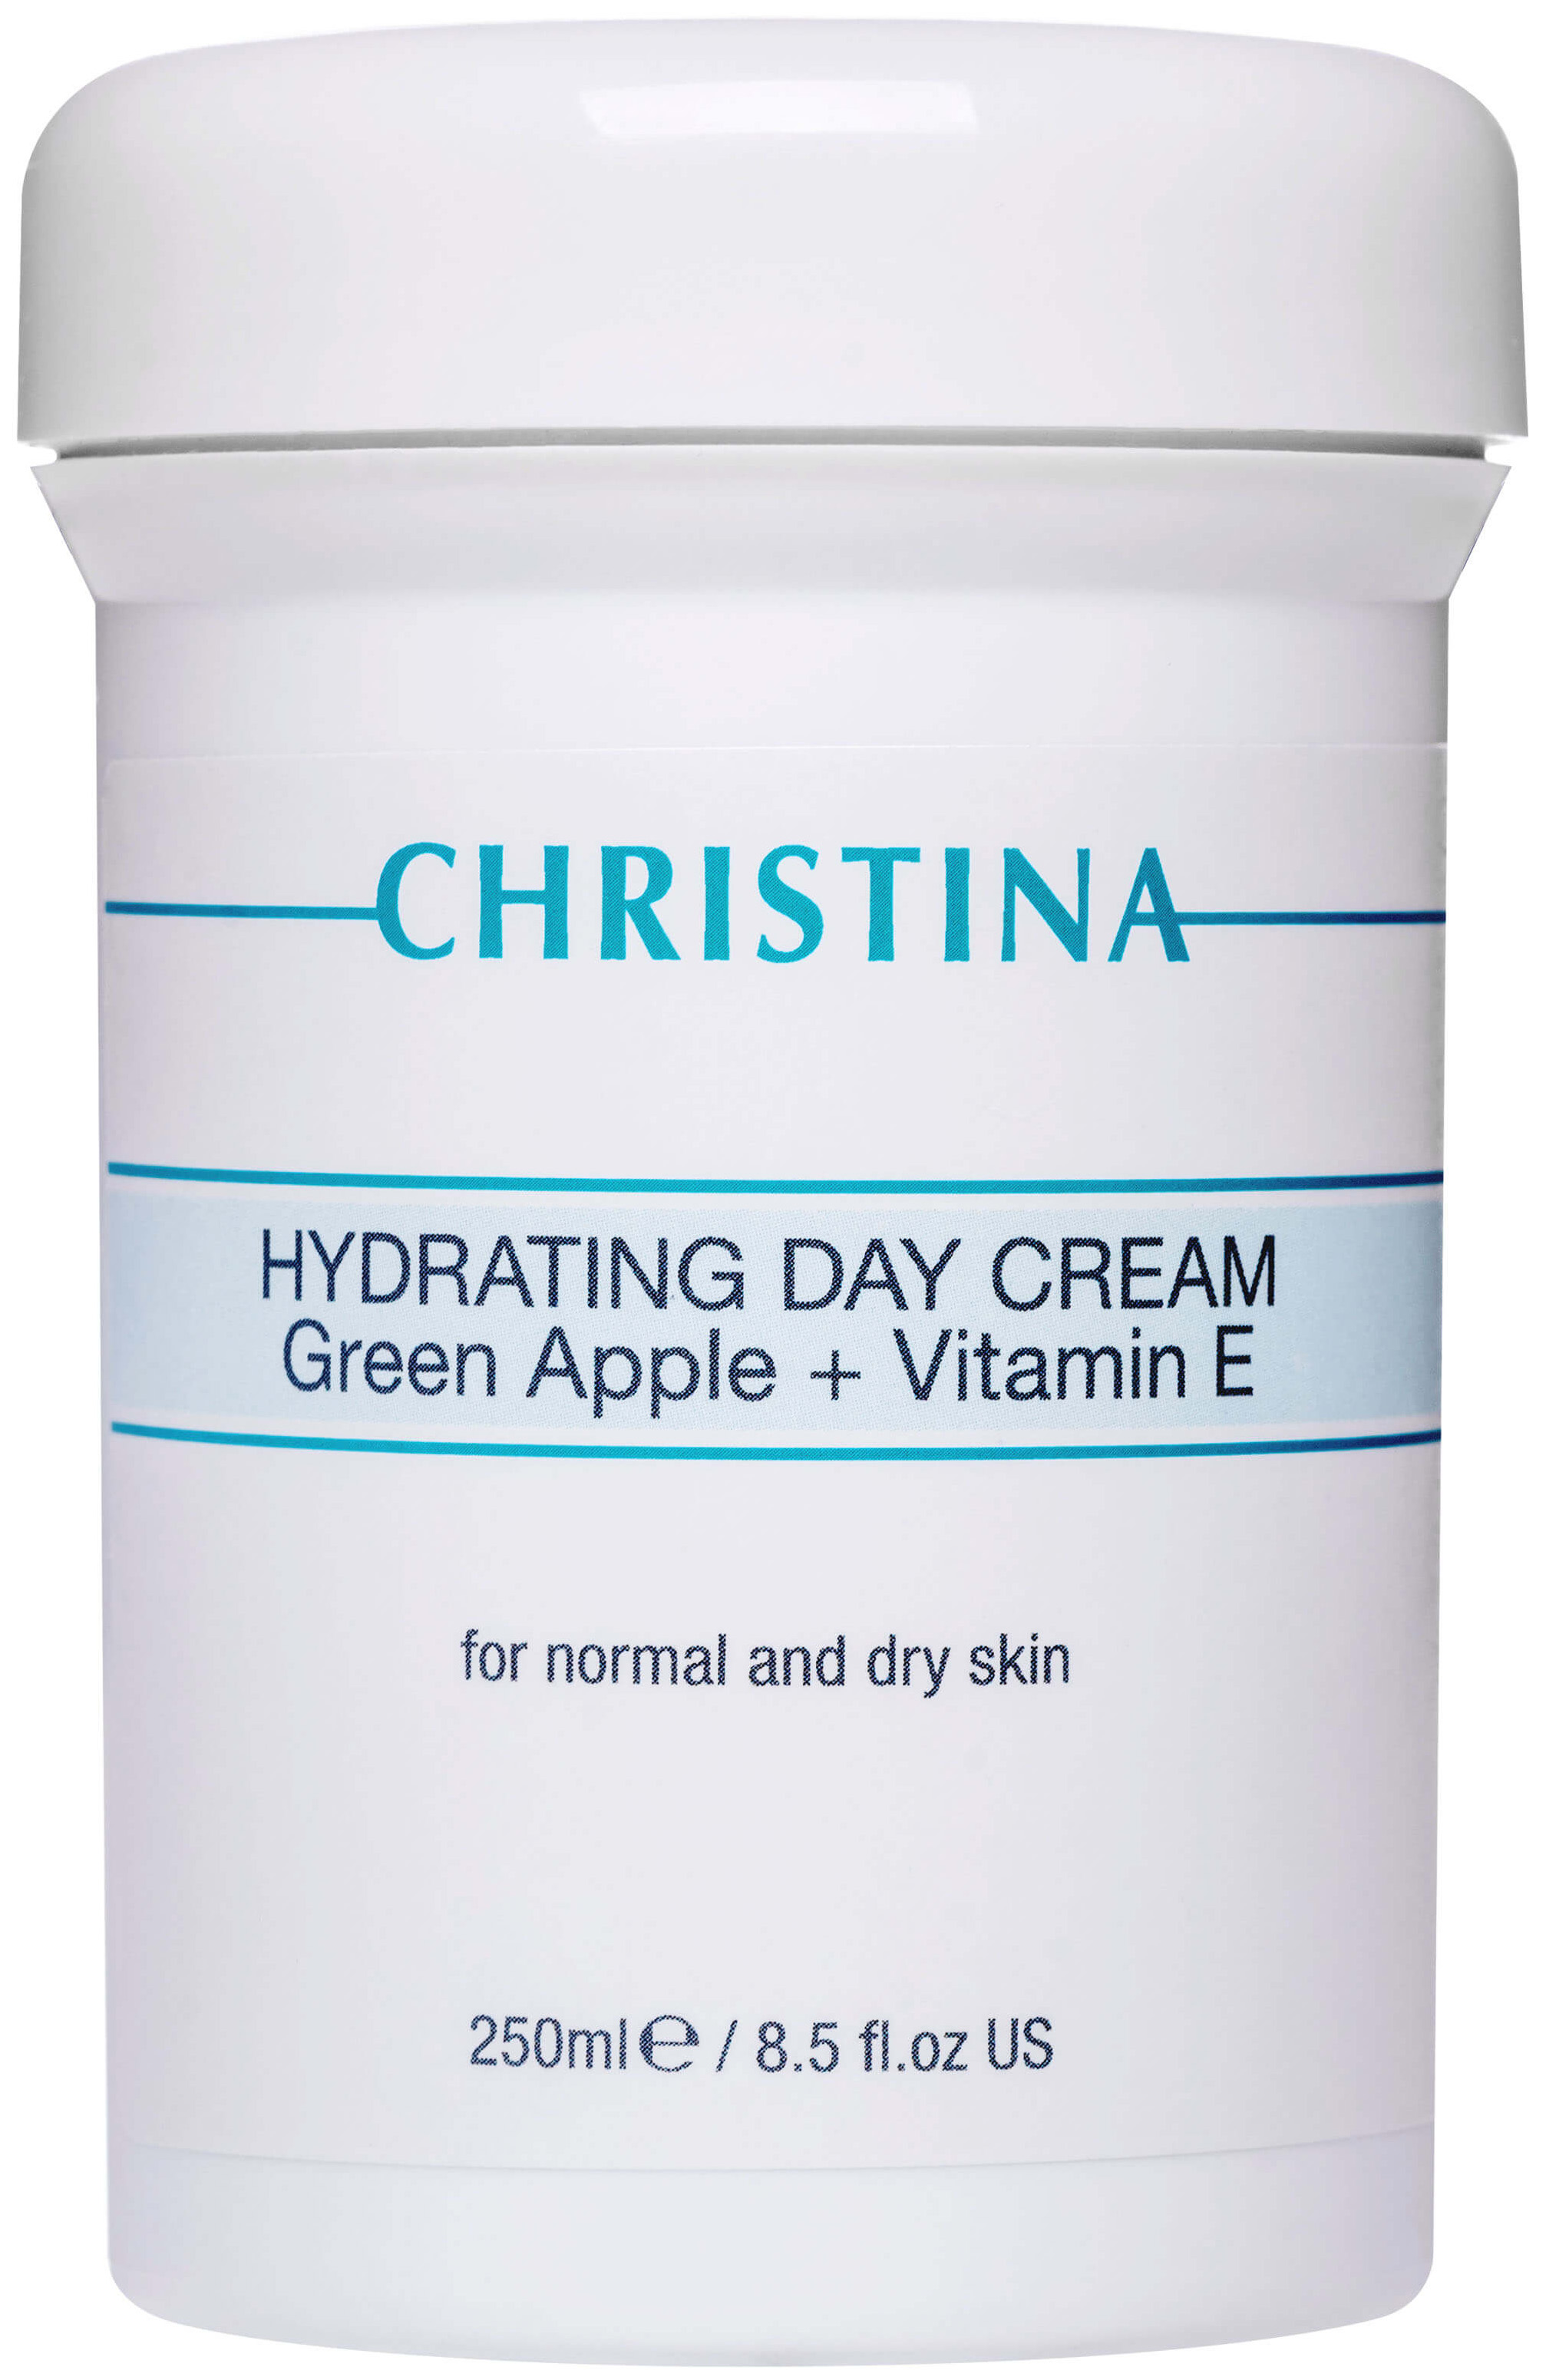 Крем для лица Christina Hydrating Day Cream Green Apple + Vitamin E 250 мл фото